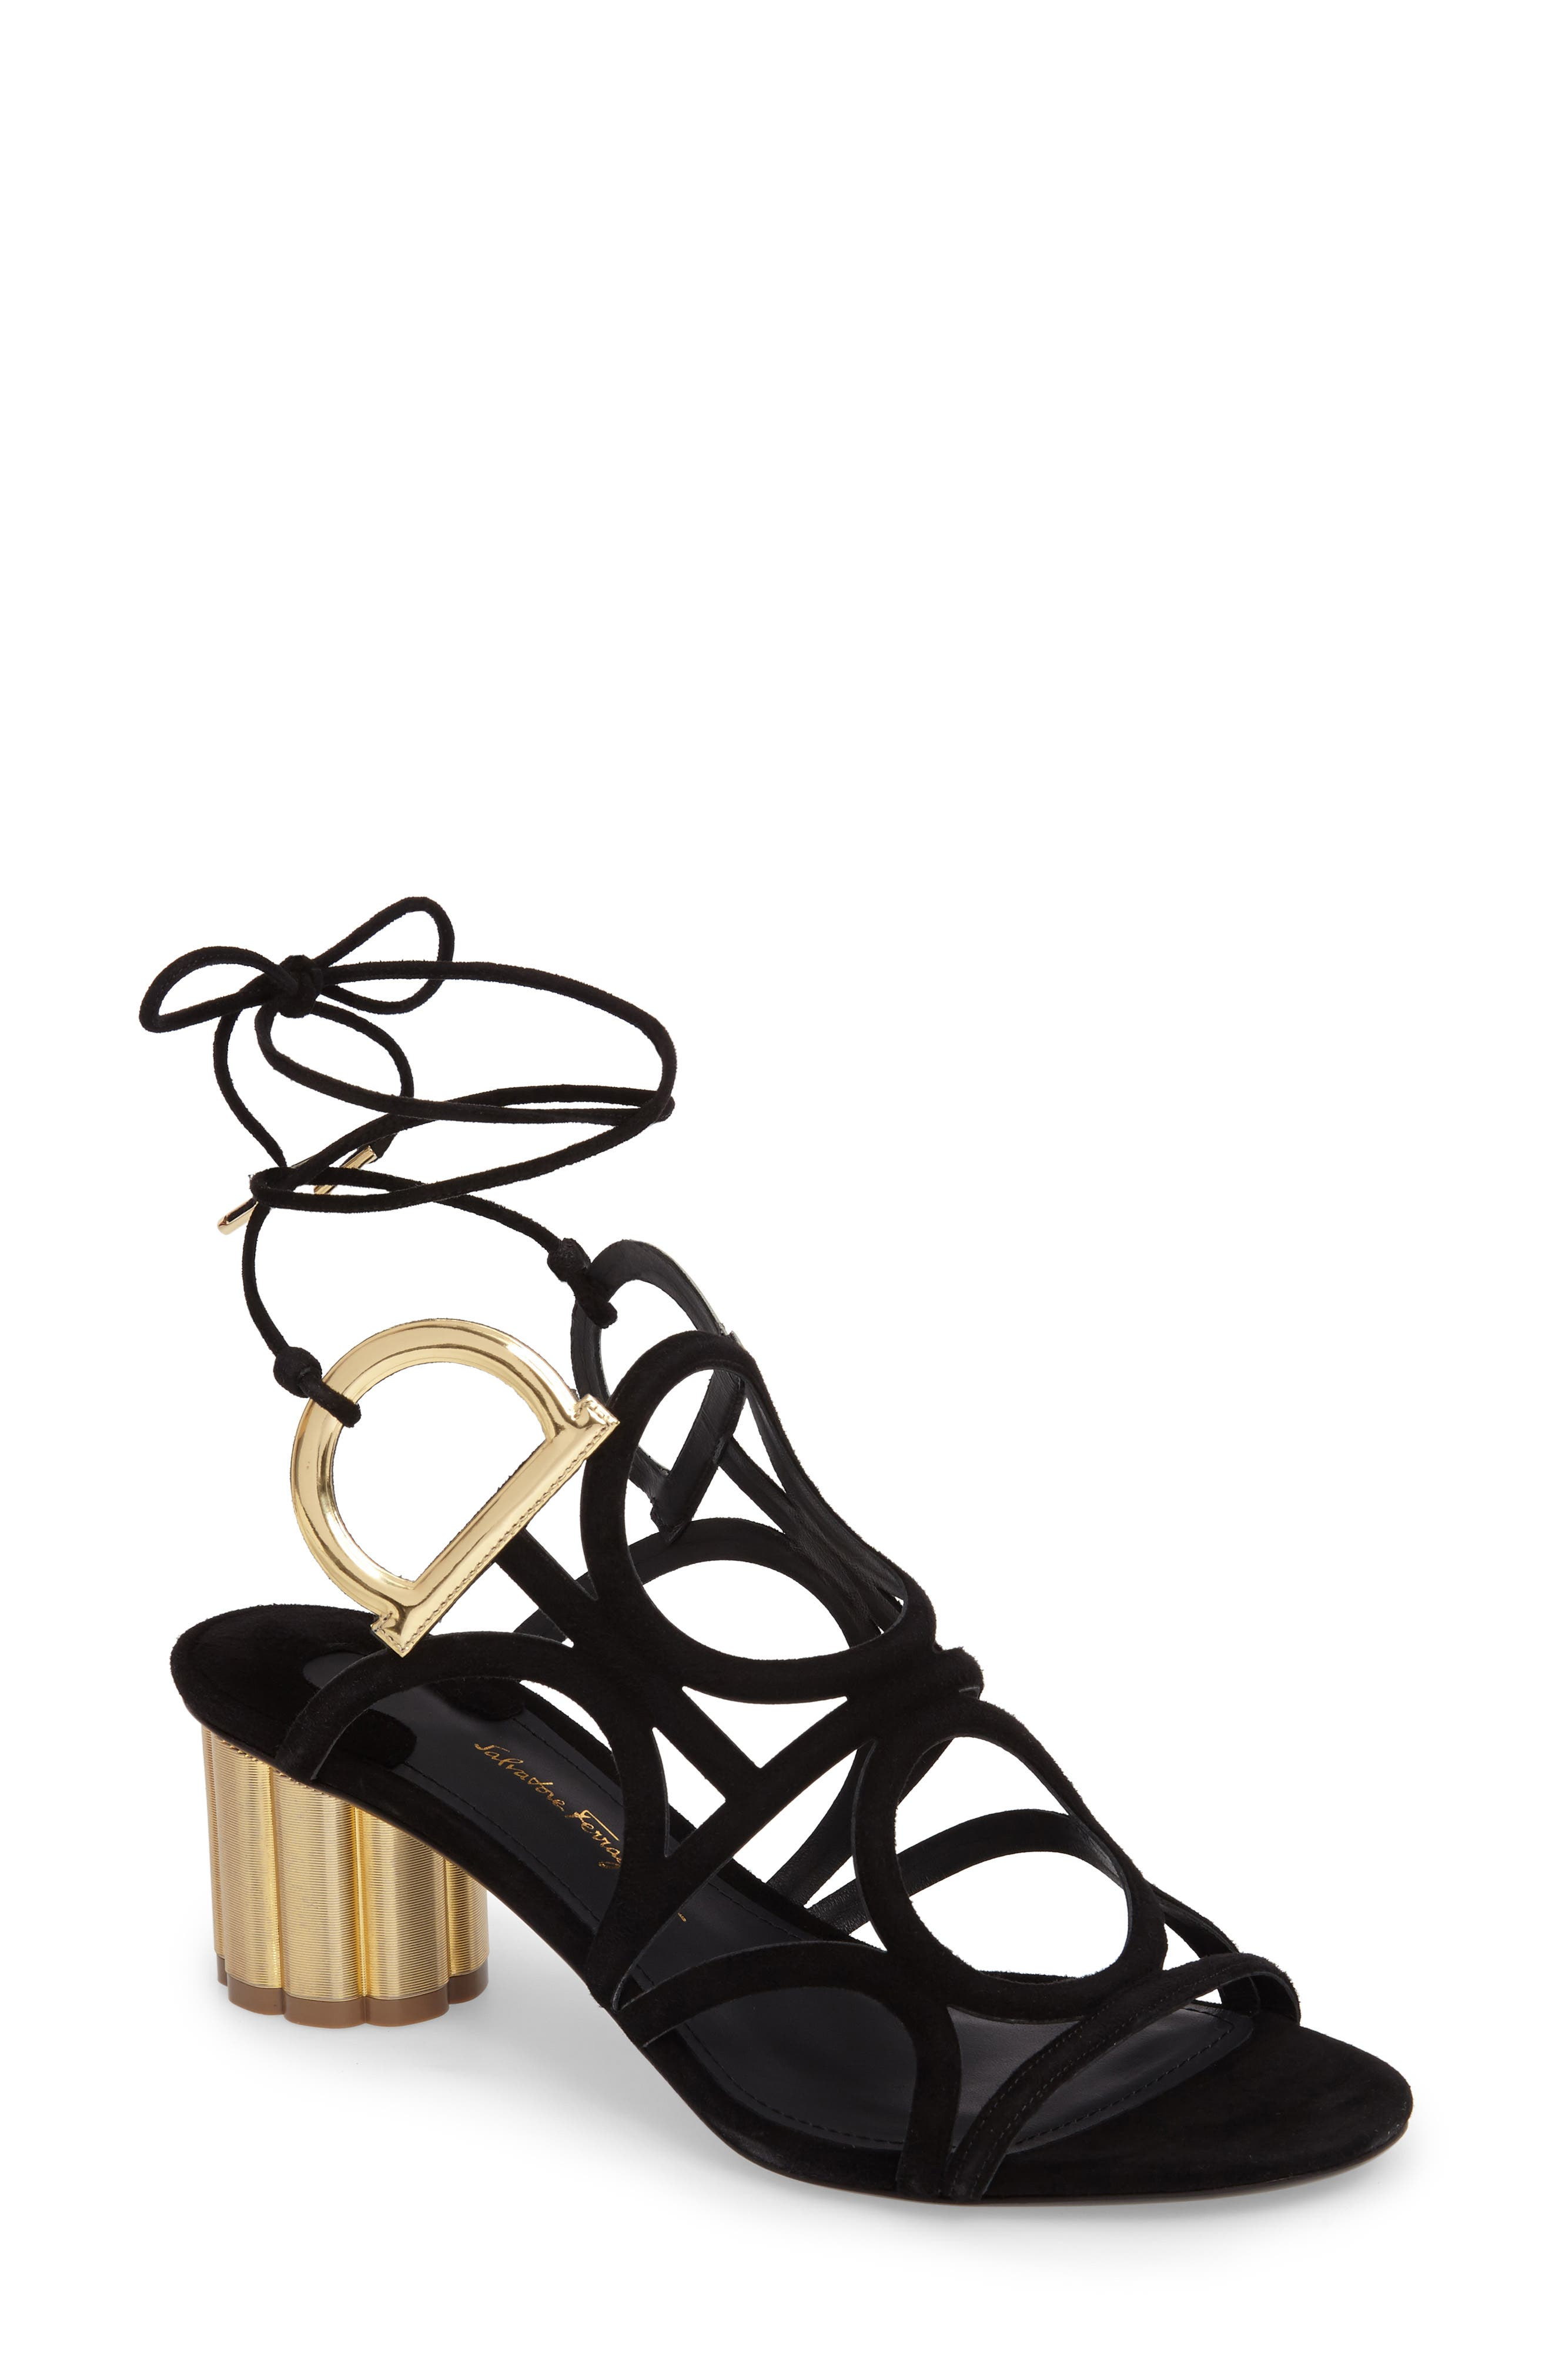 Main Image - Salvatore Ferragamo Vinci Sandal (Women)